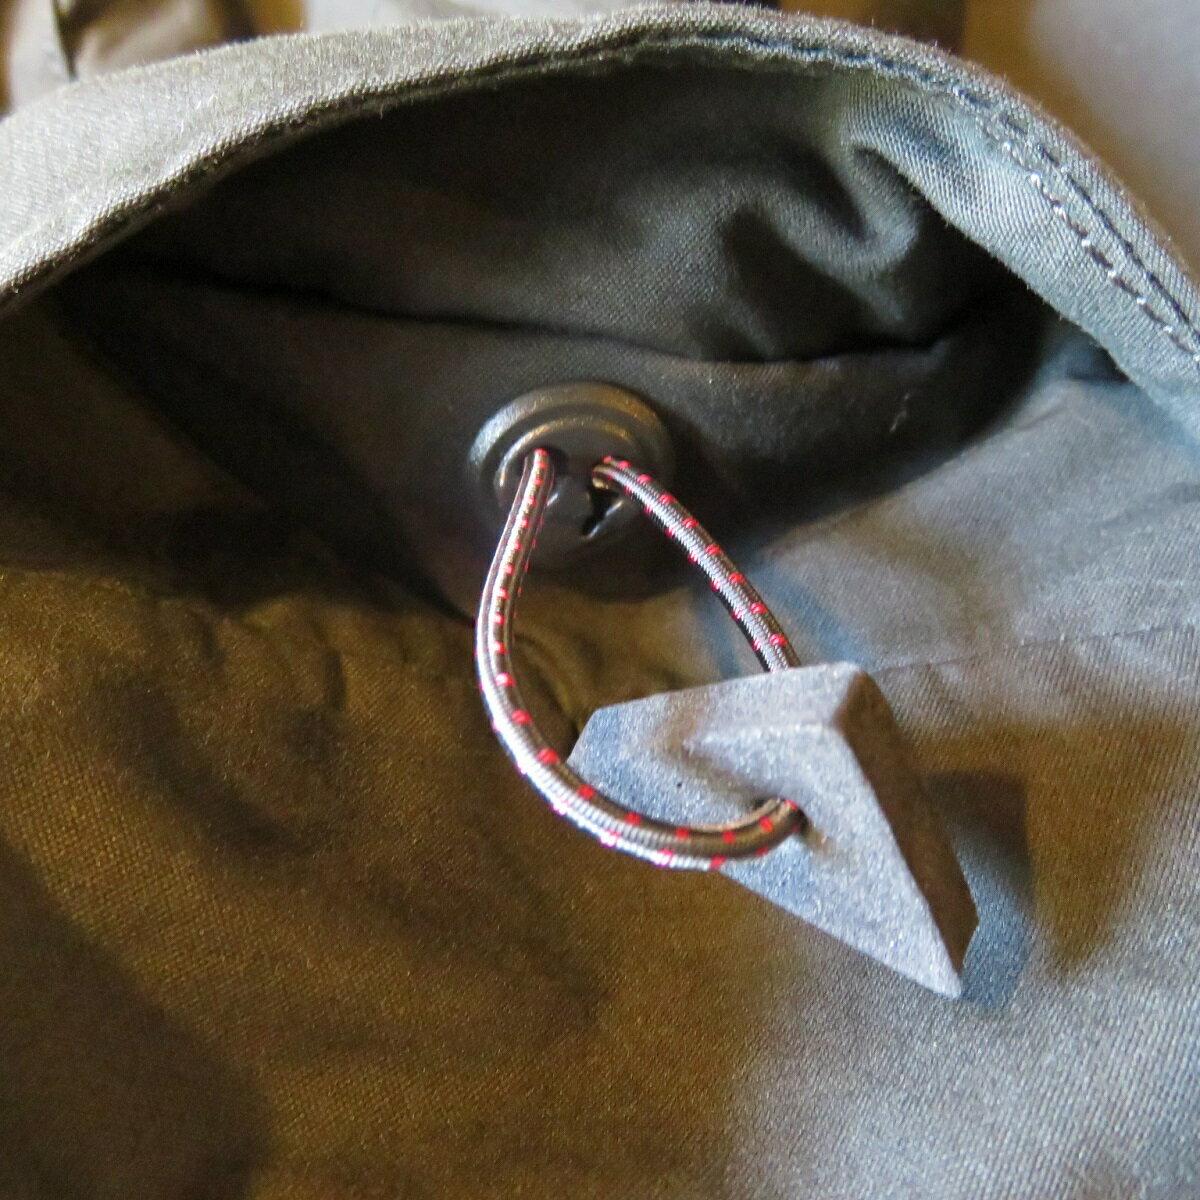 KLATTERMUSEN(クレッタルムーセン) Einride Jacketエイナリーダ ジャケット M's Charcoal Lサイズ